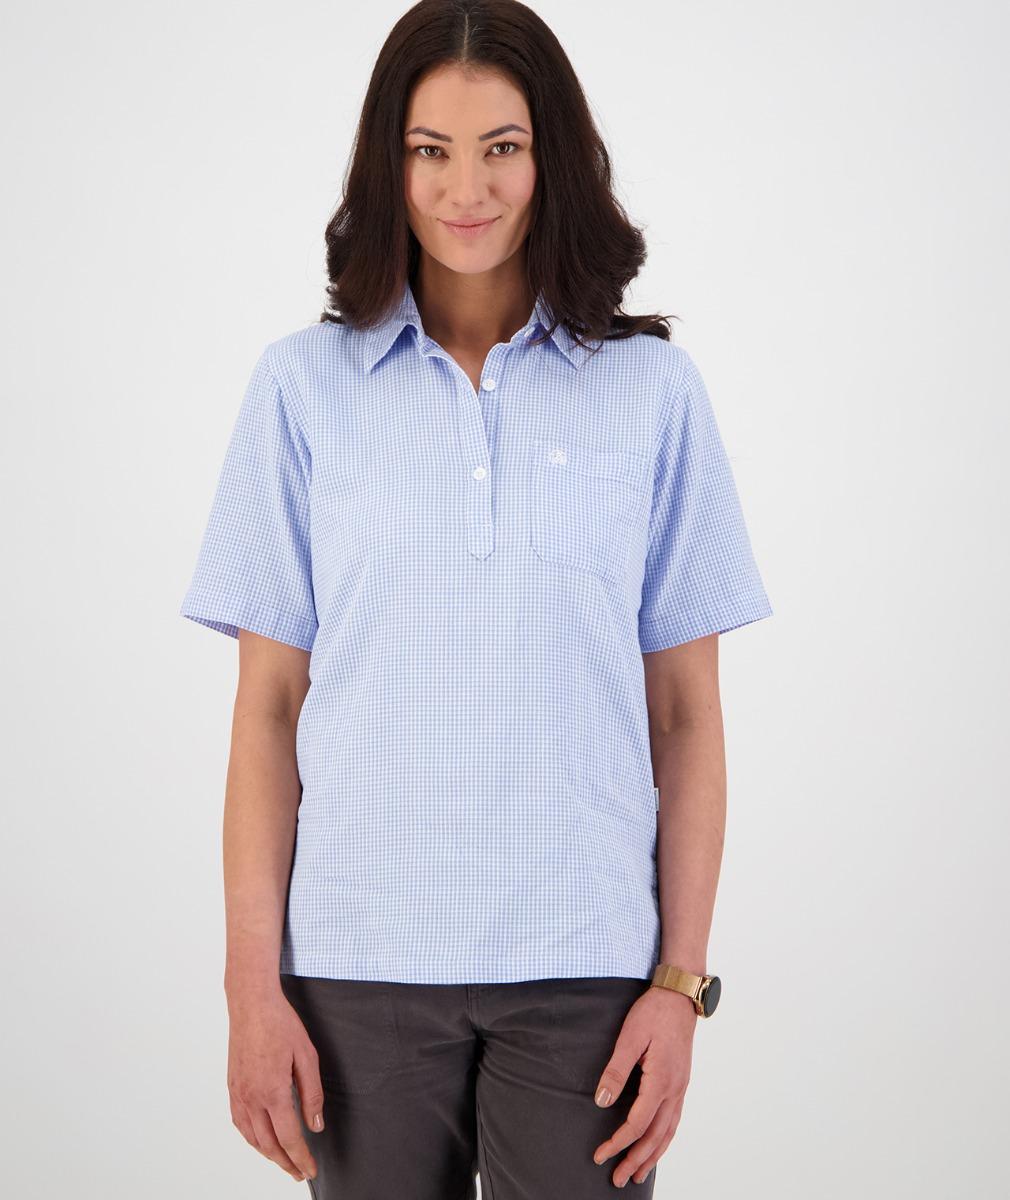 Swanndri Women's Tasman 100% Cotton Short Sleeve Shirt in White/Blue Gingham